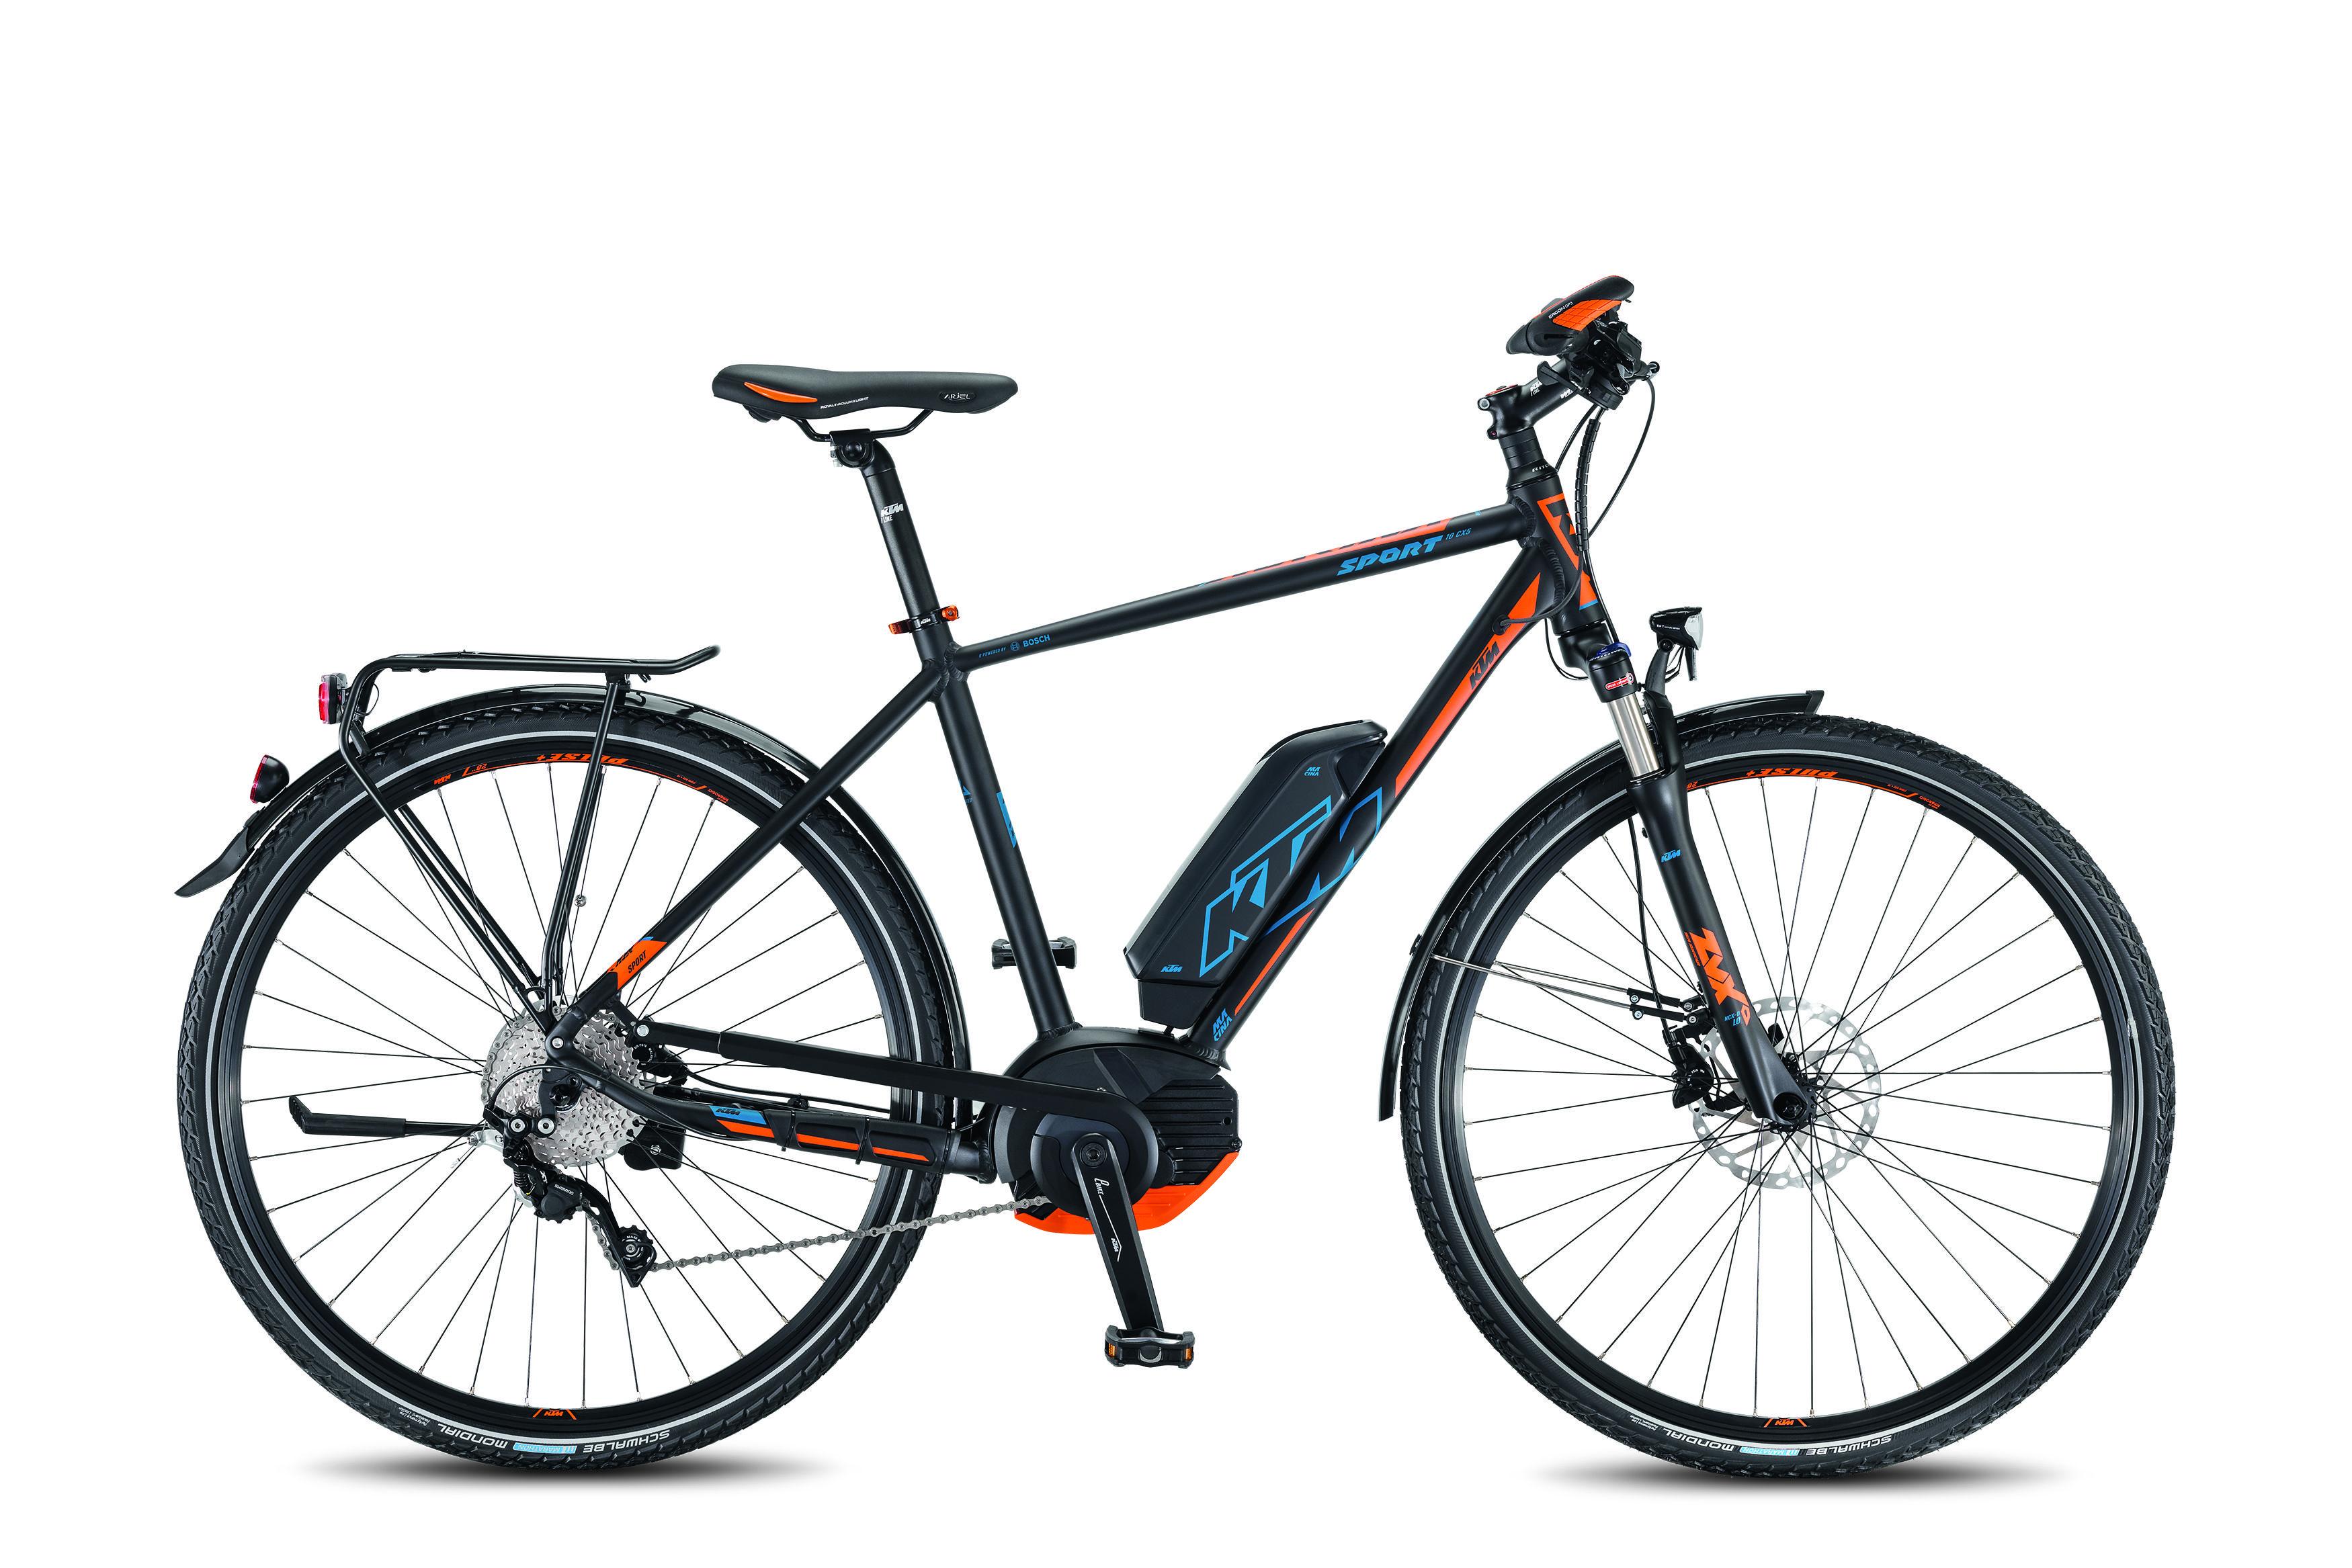 Macina Sport 10 CX5 | Pedelec, Fahrrad blog, Radfahren